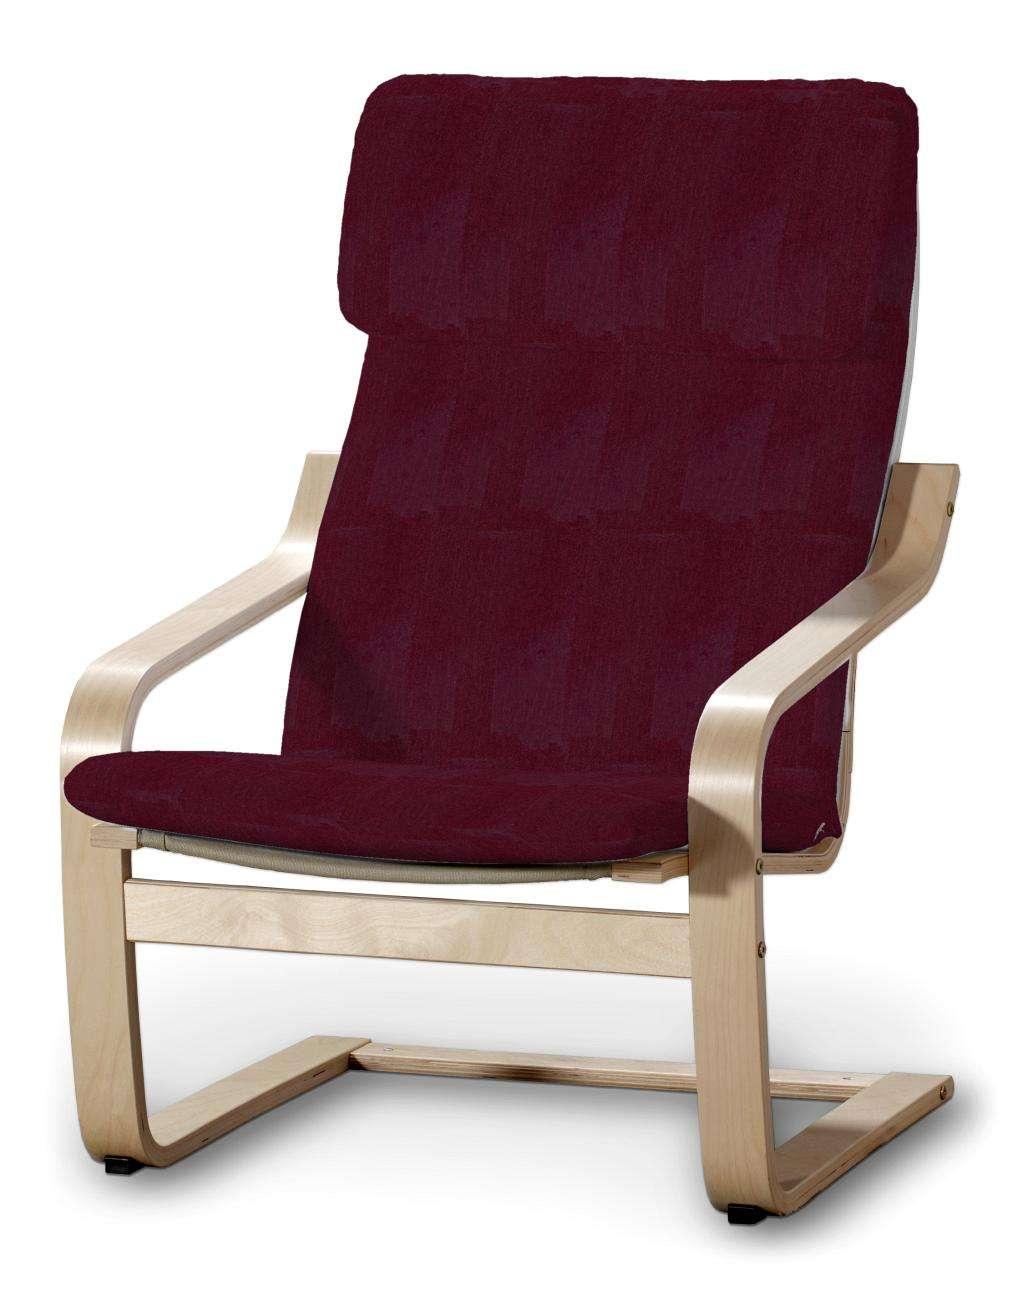 POÄNG  fotelio užvalkalas Poäng armchair kolekcijoje Chenille, audinys: 702-19